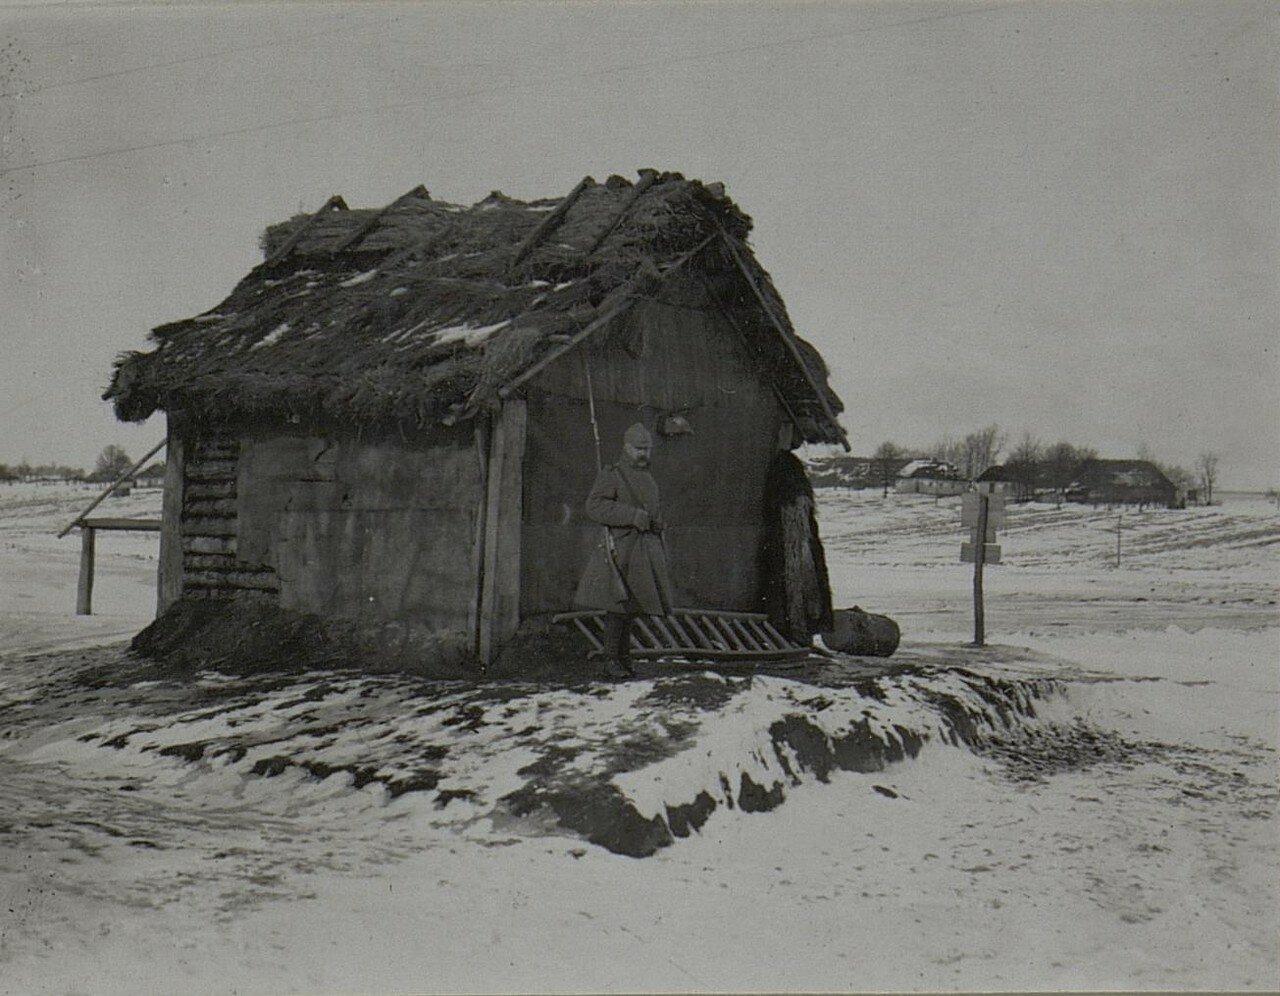 Павловичи. Караульная будка на краю села